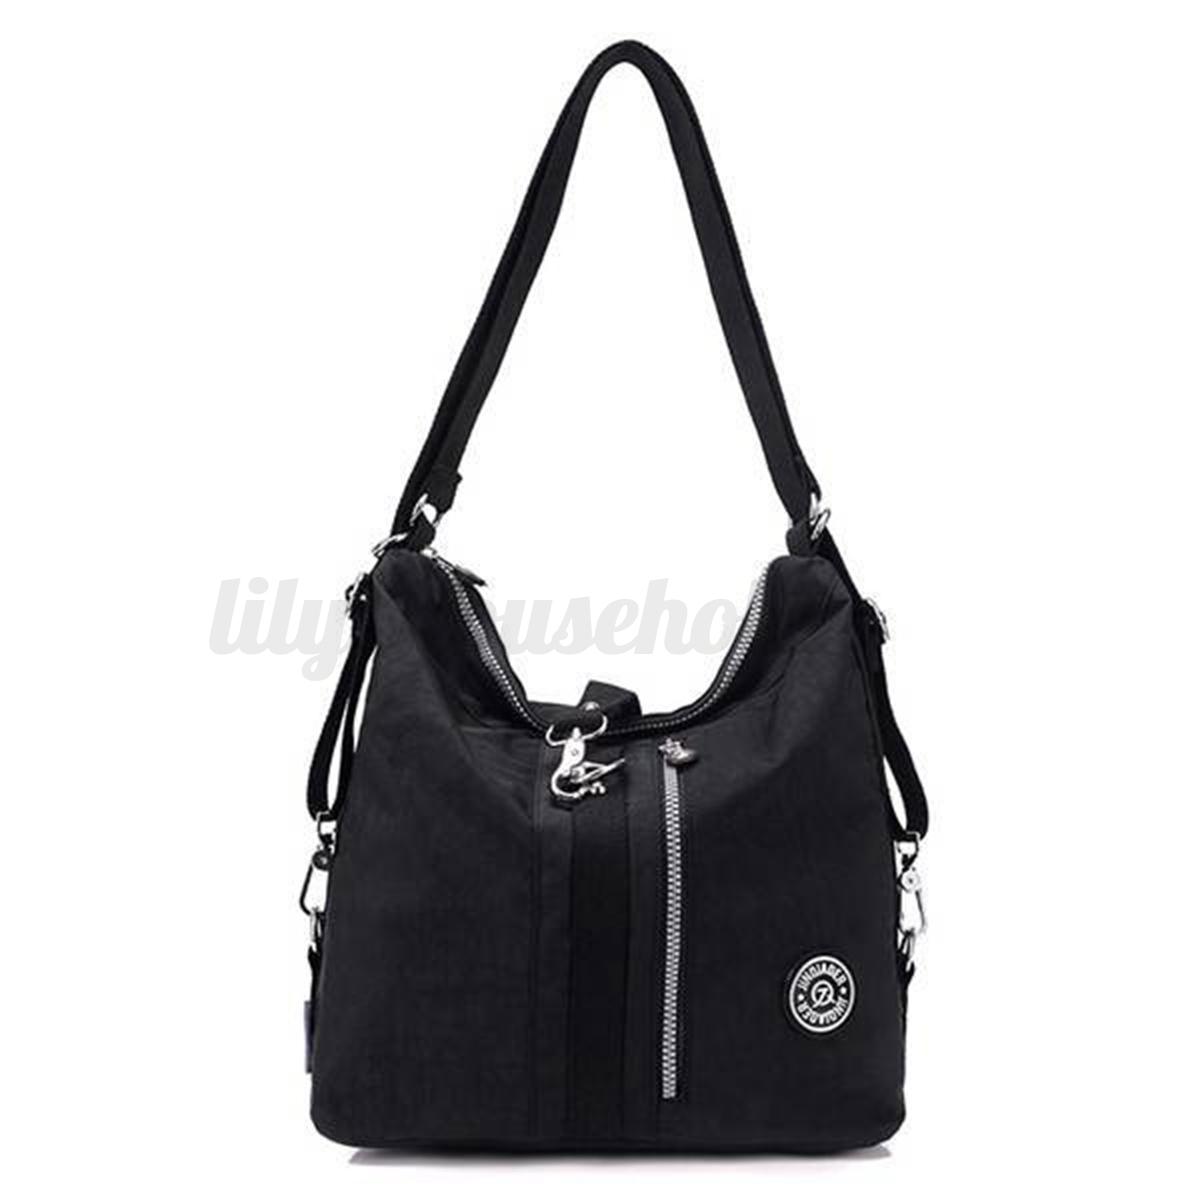 damen wasserdicht beutel rucksack umh ngetasche handtasche. Black Bedroom Furniture Sets. Home Design Ideas